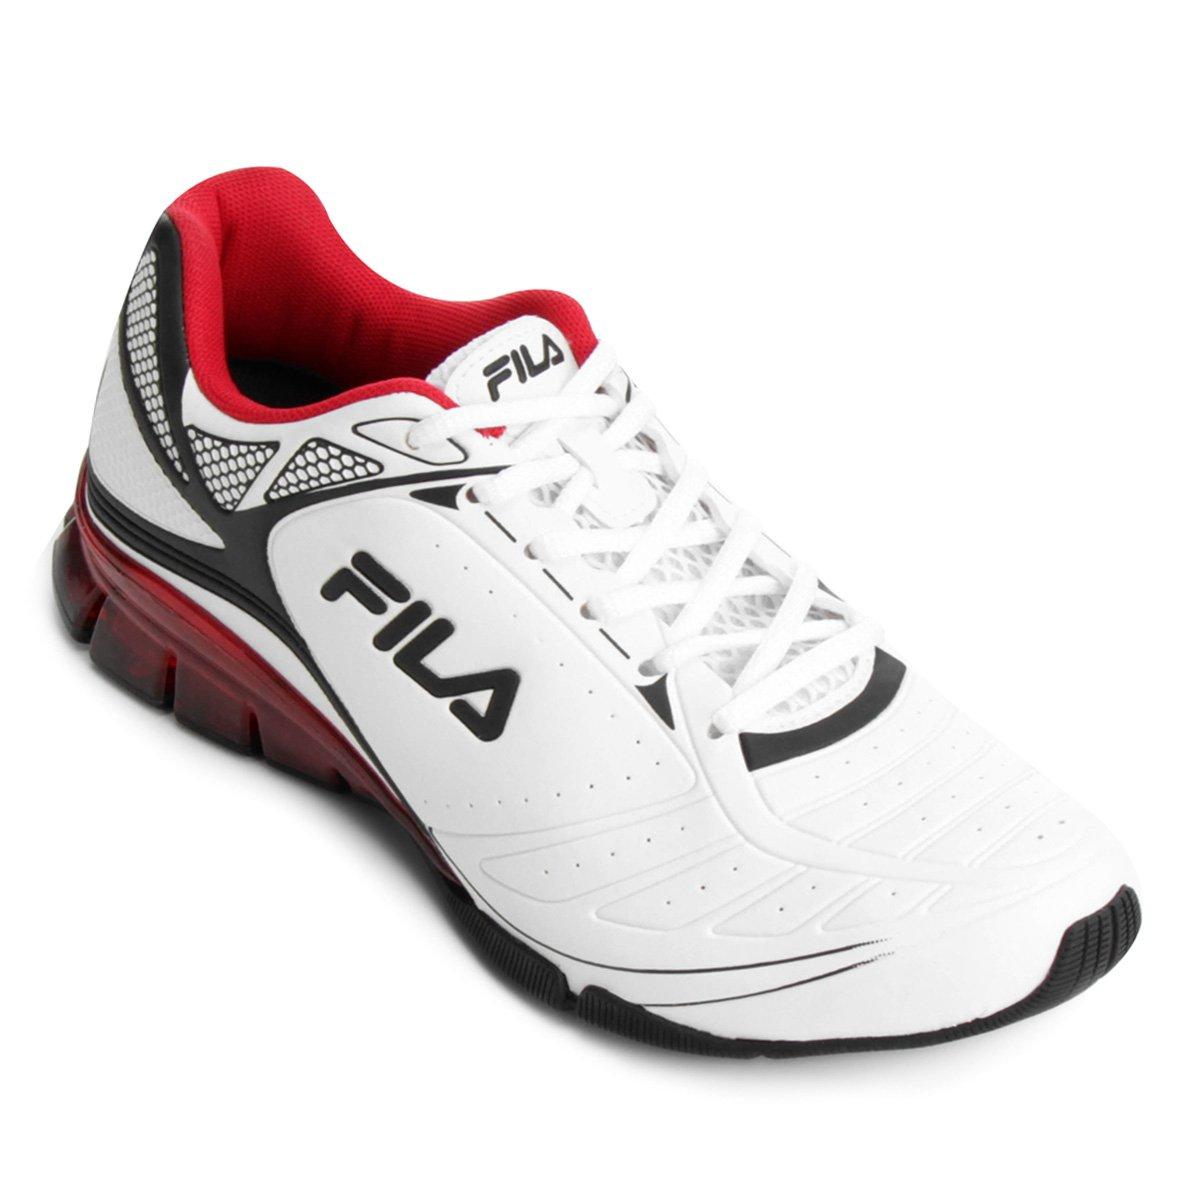 16045073a57 FornecedorNetshoes. Tênis Fila Accelerate Masculino